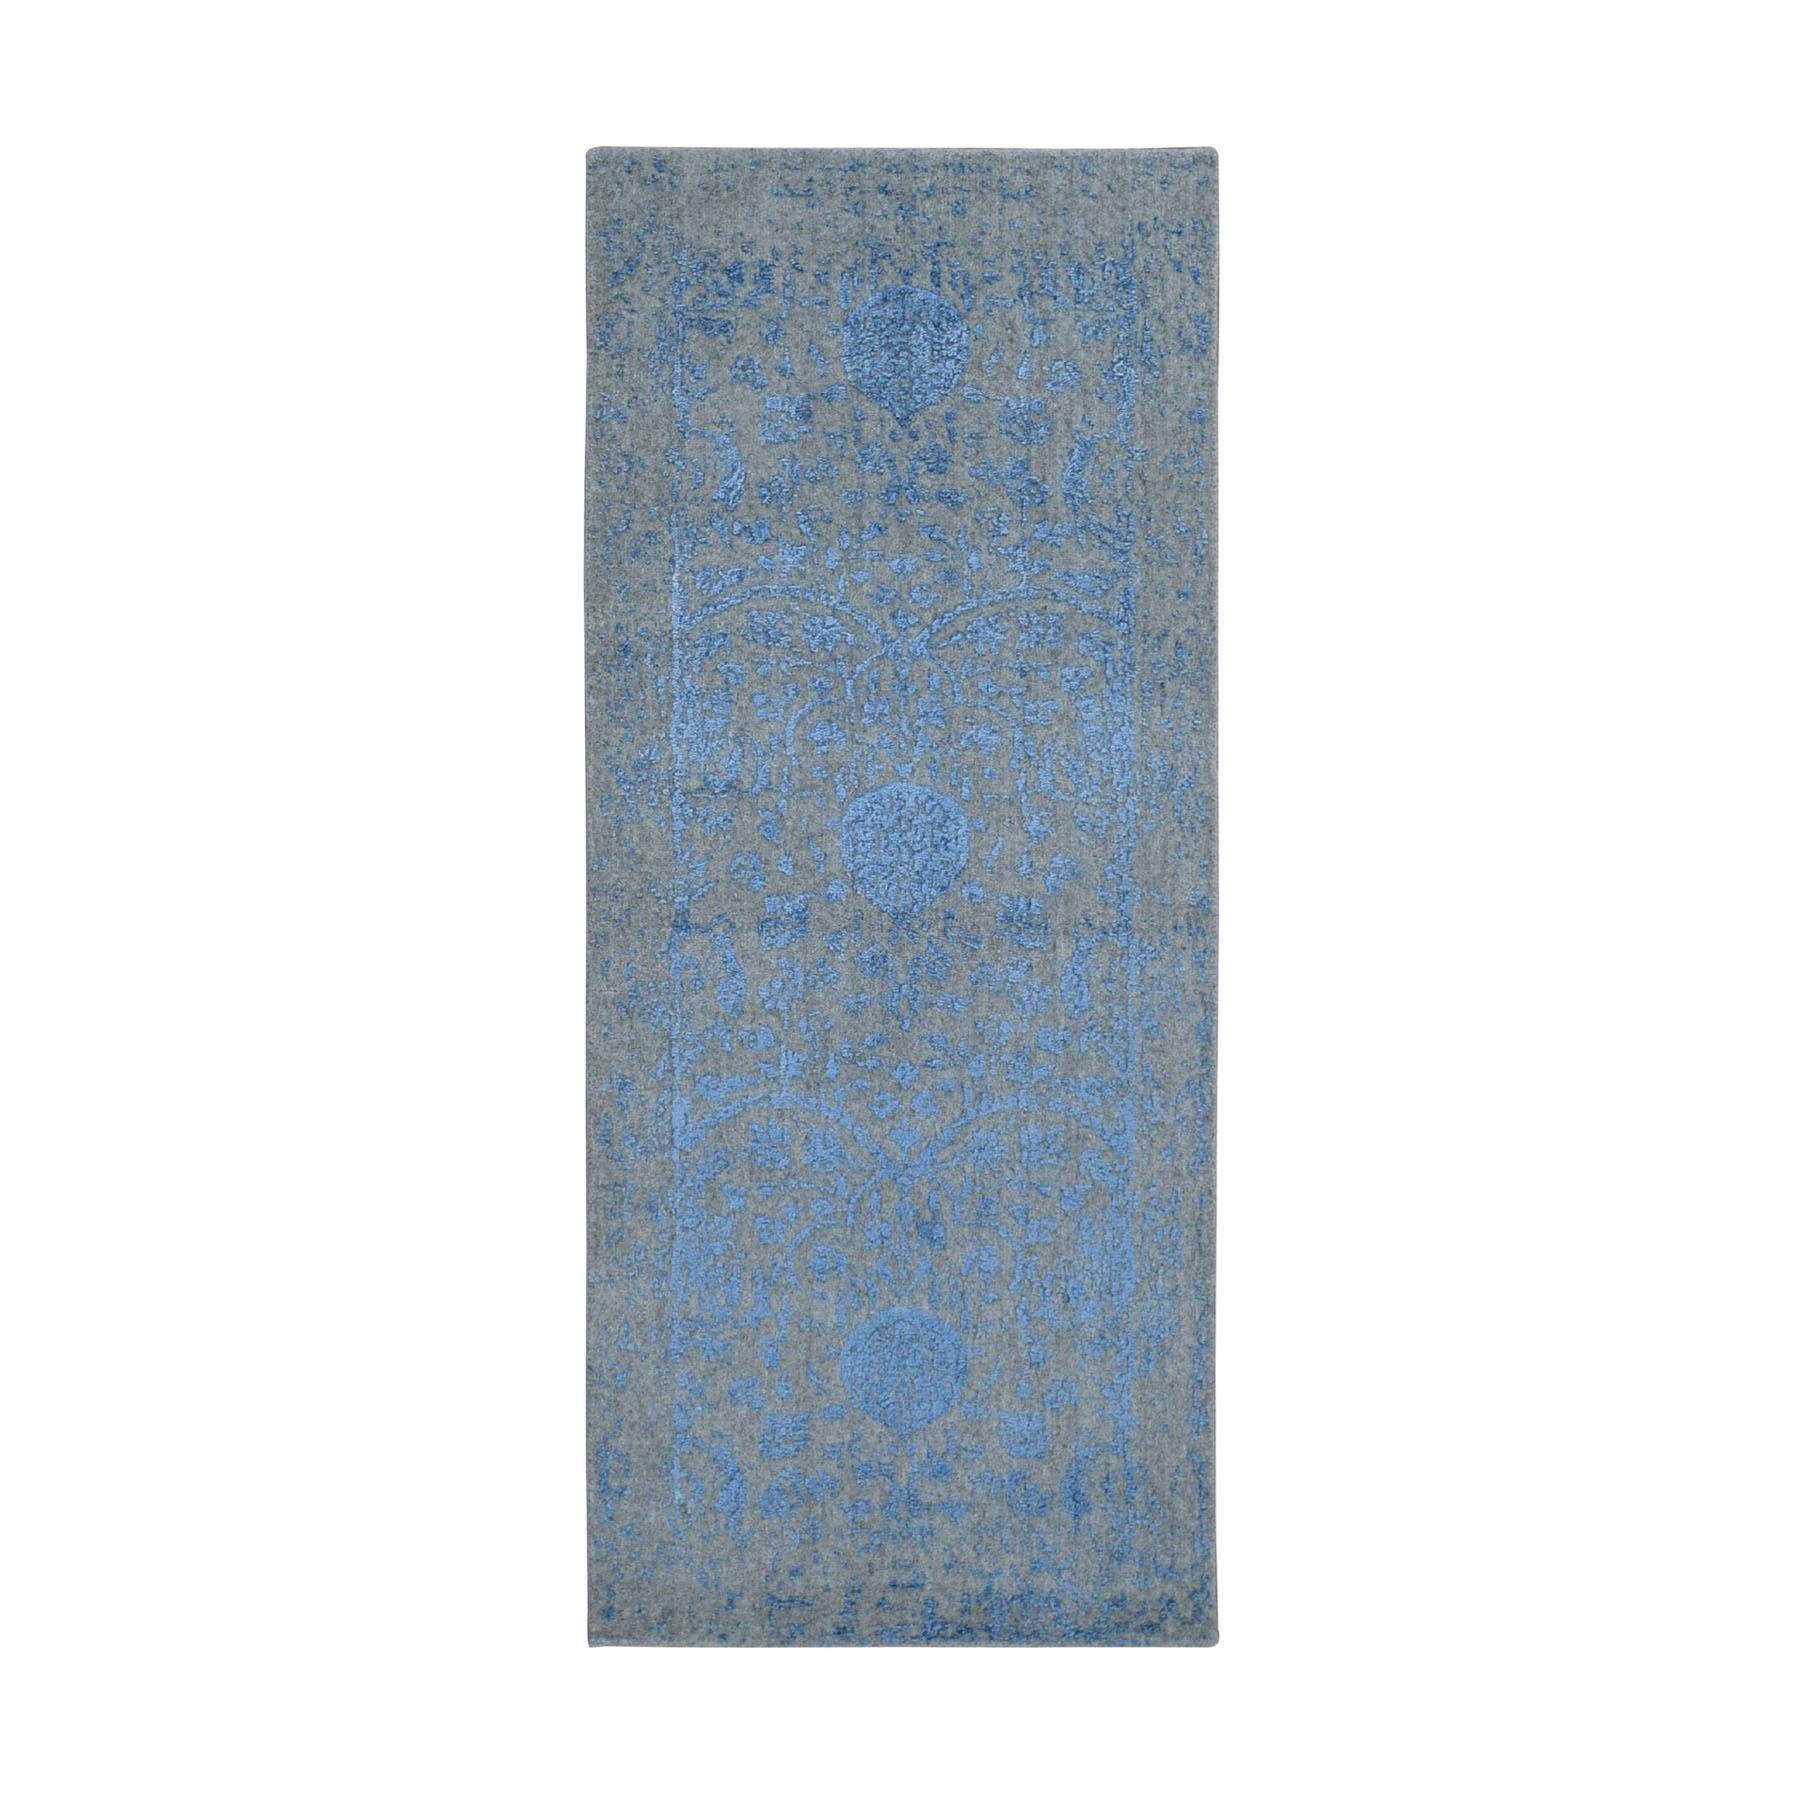 "2'5""x5'10"" Blue Jacquard Hand Loomed Wool and Art Silk Pomegranate Design Runner Oriental Rug"